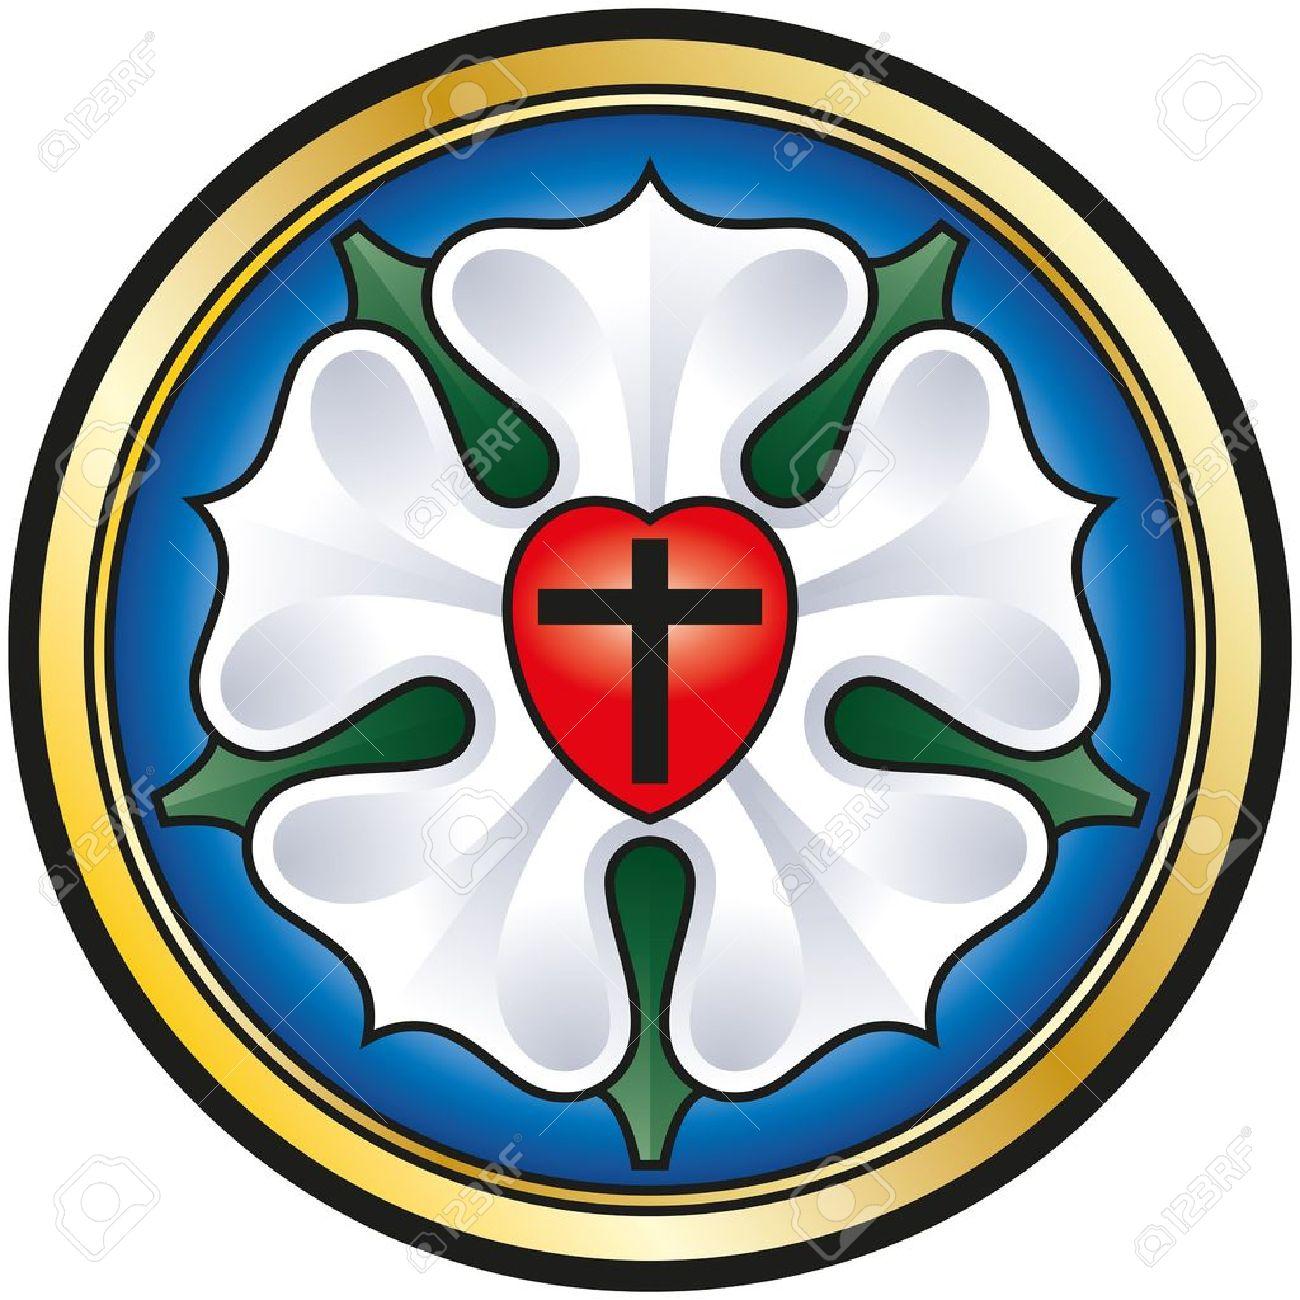 Protestant reformation symbols view symbol buycottarizona